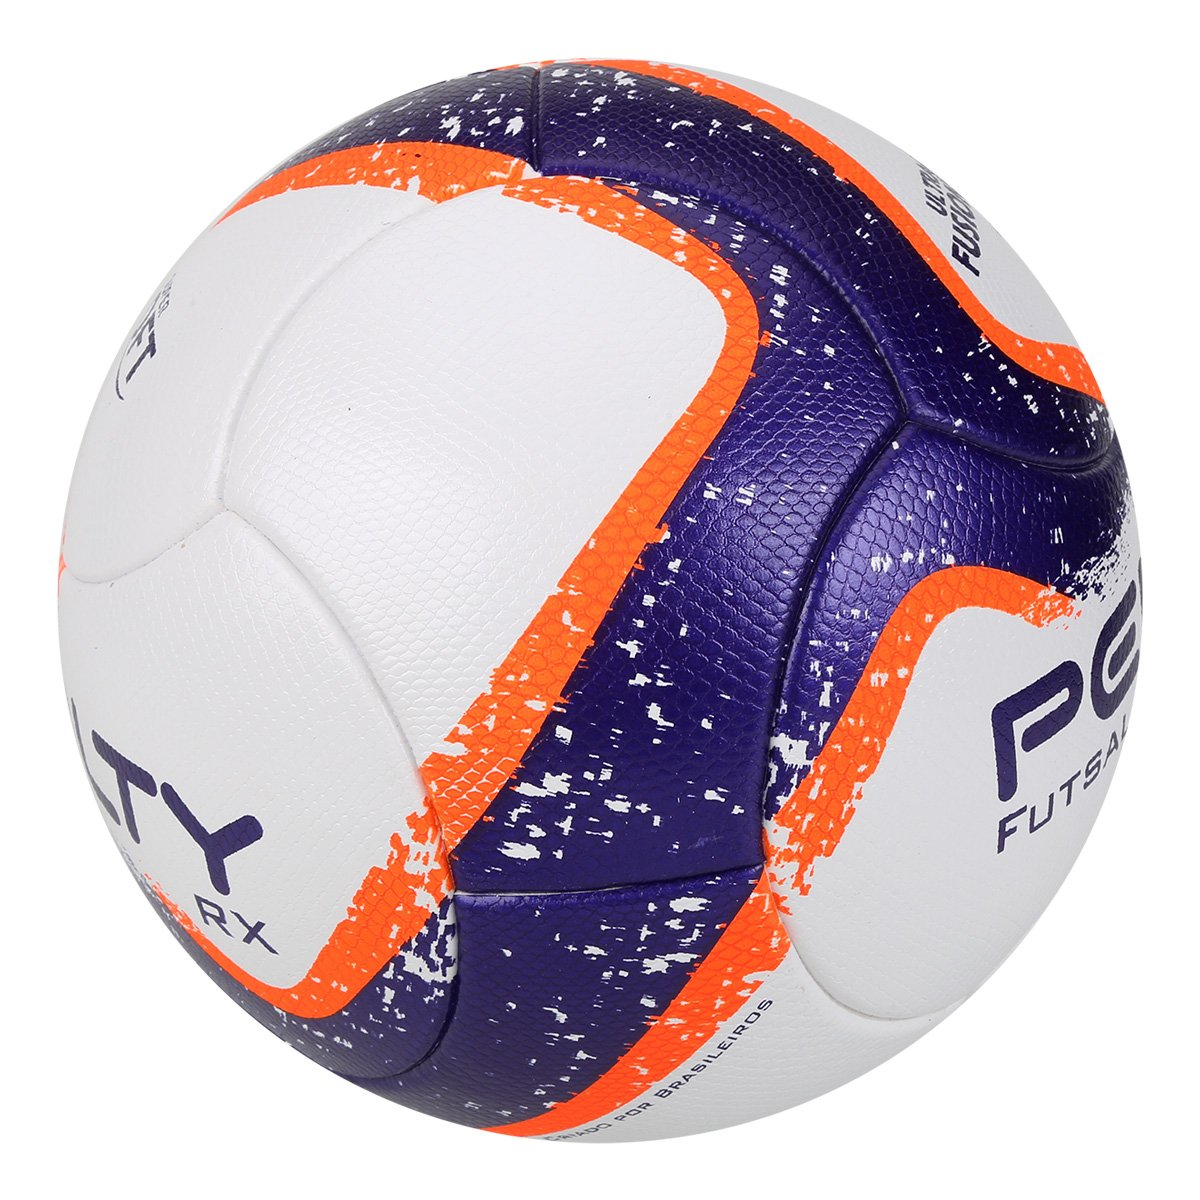 Bola Futsal Penalty RX 500 R1 Fusion VIII - Compre Agora  26567bcb6f80d